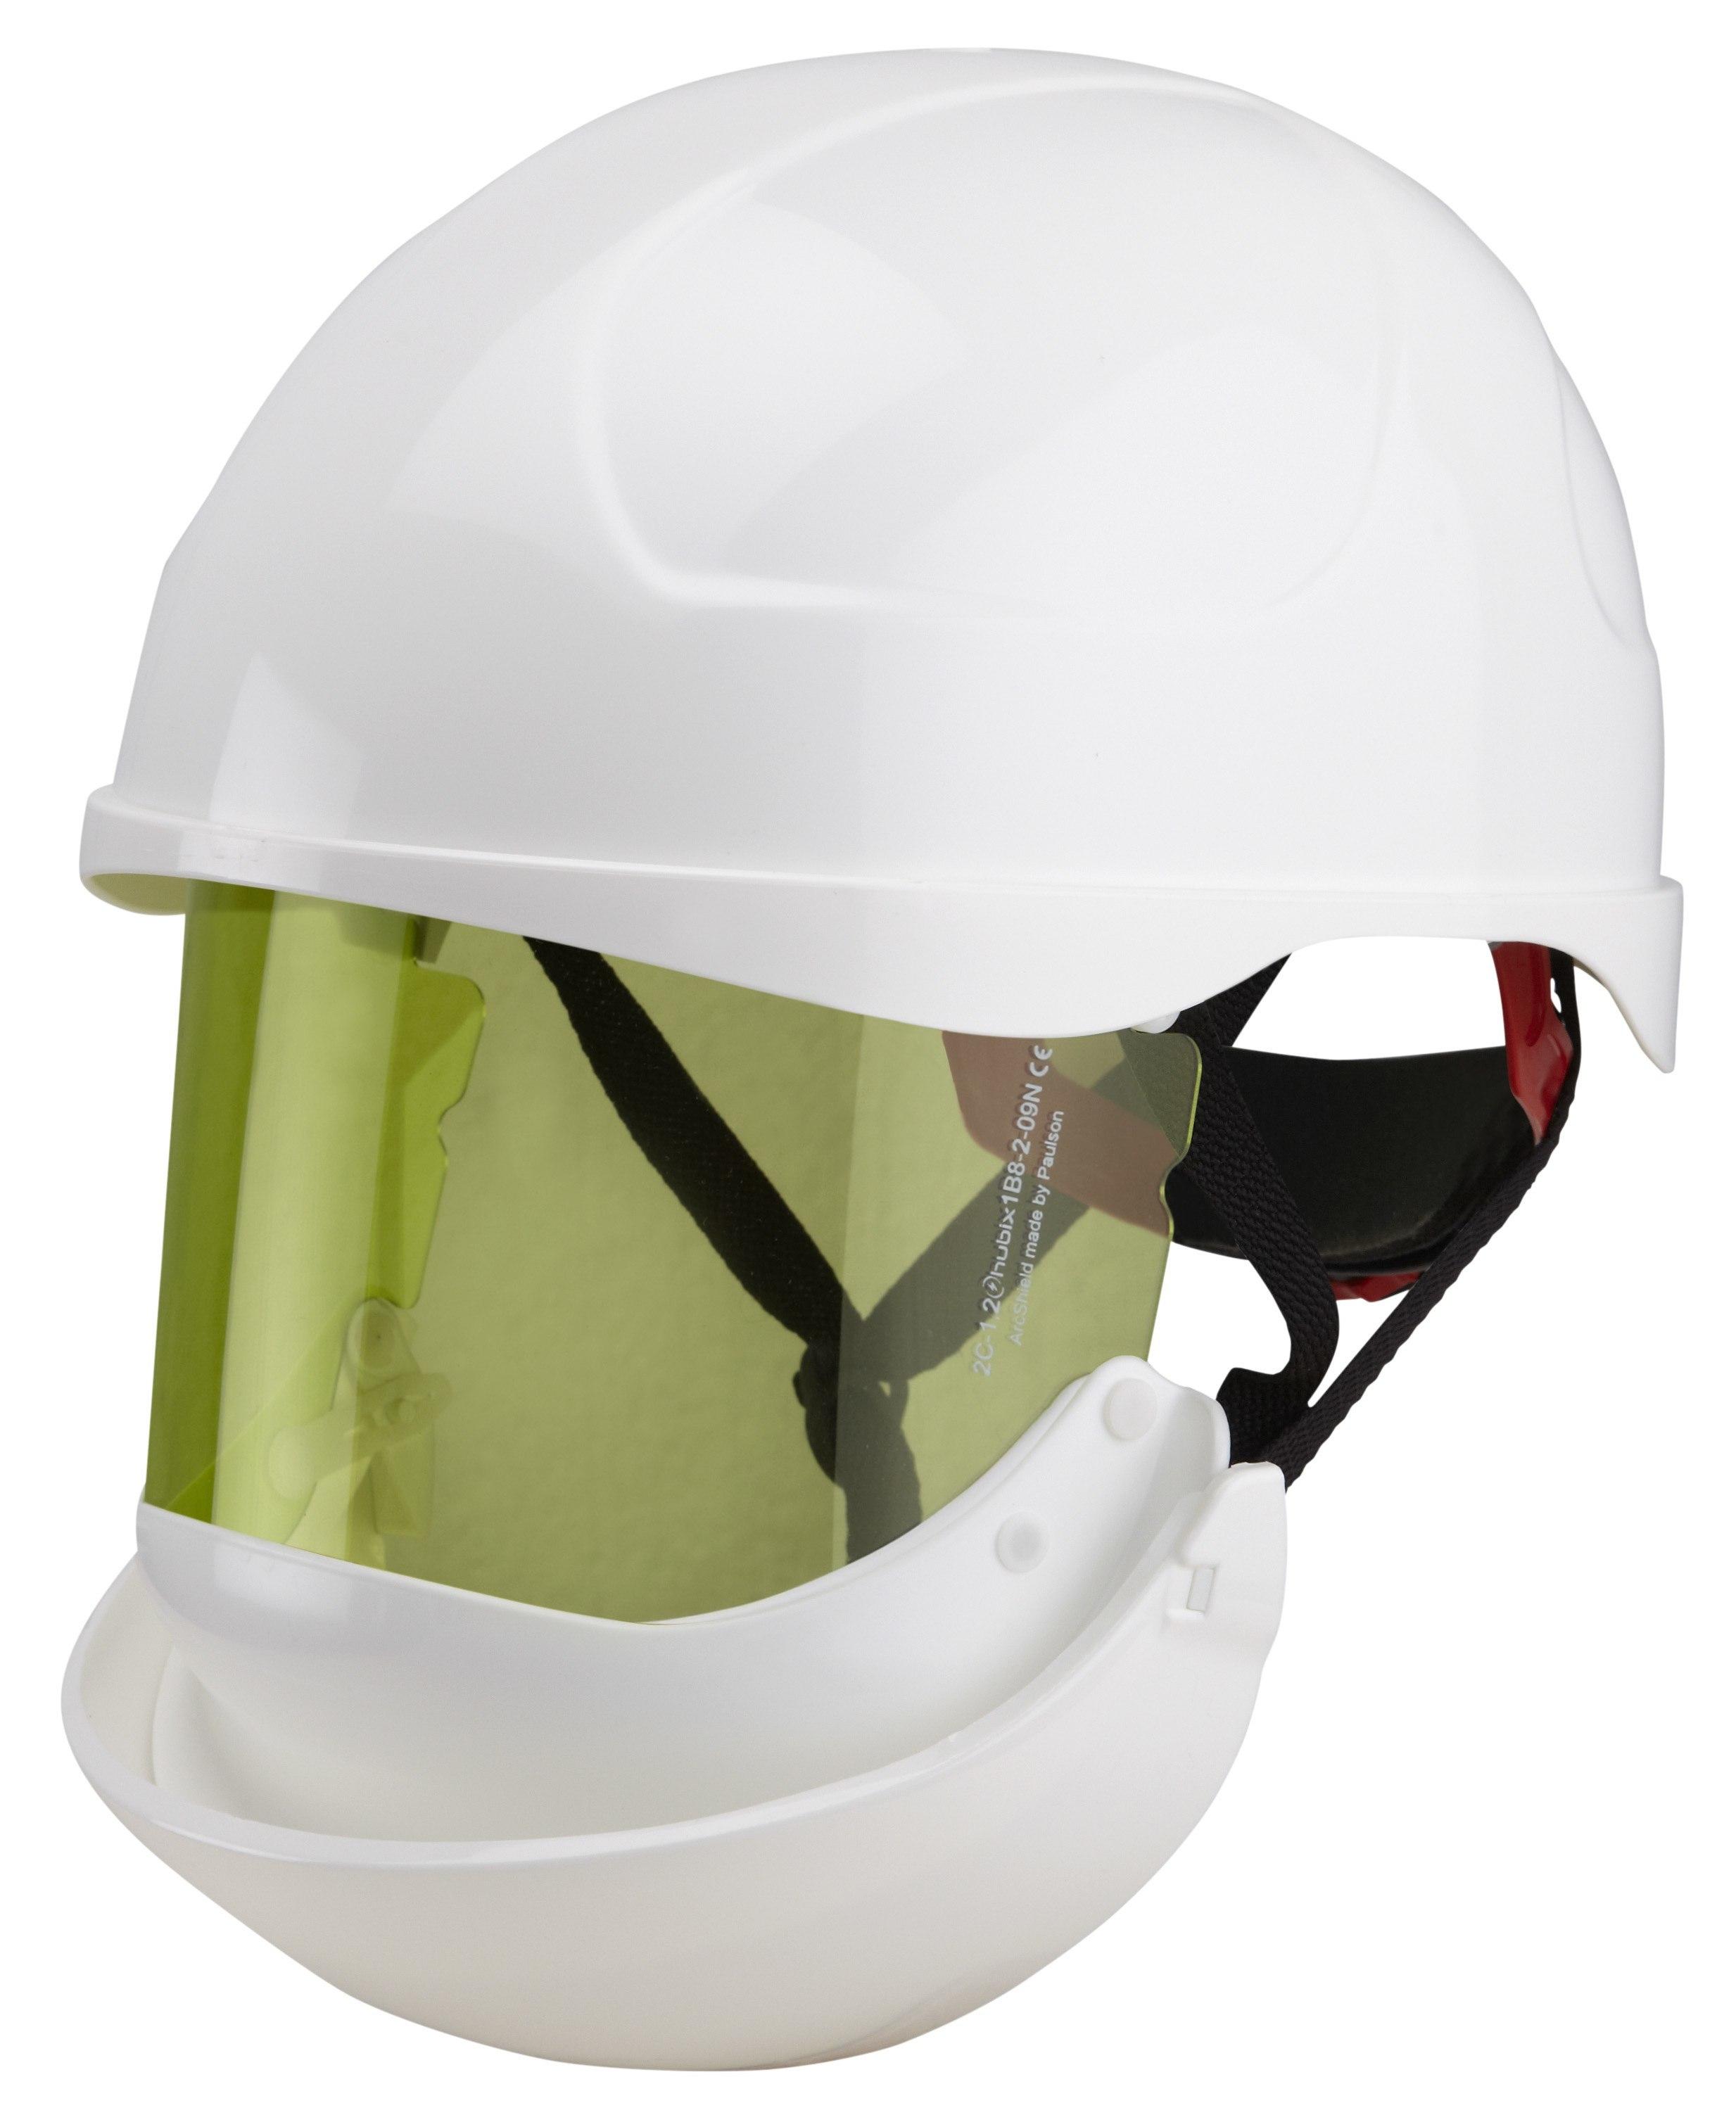 ProGARM 2688 Arc Flash Safety Helmet 8.4 cal rating Class 2-0